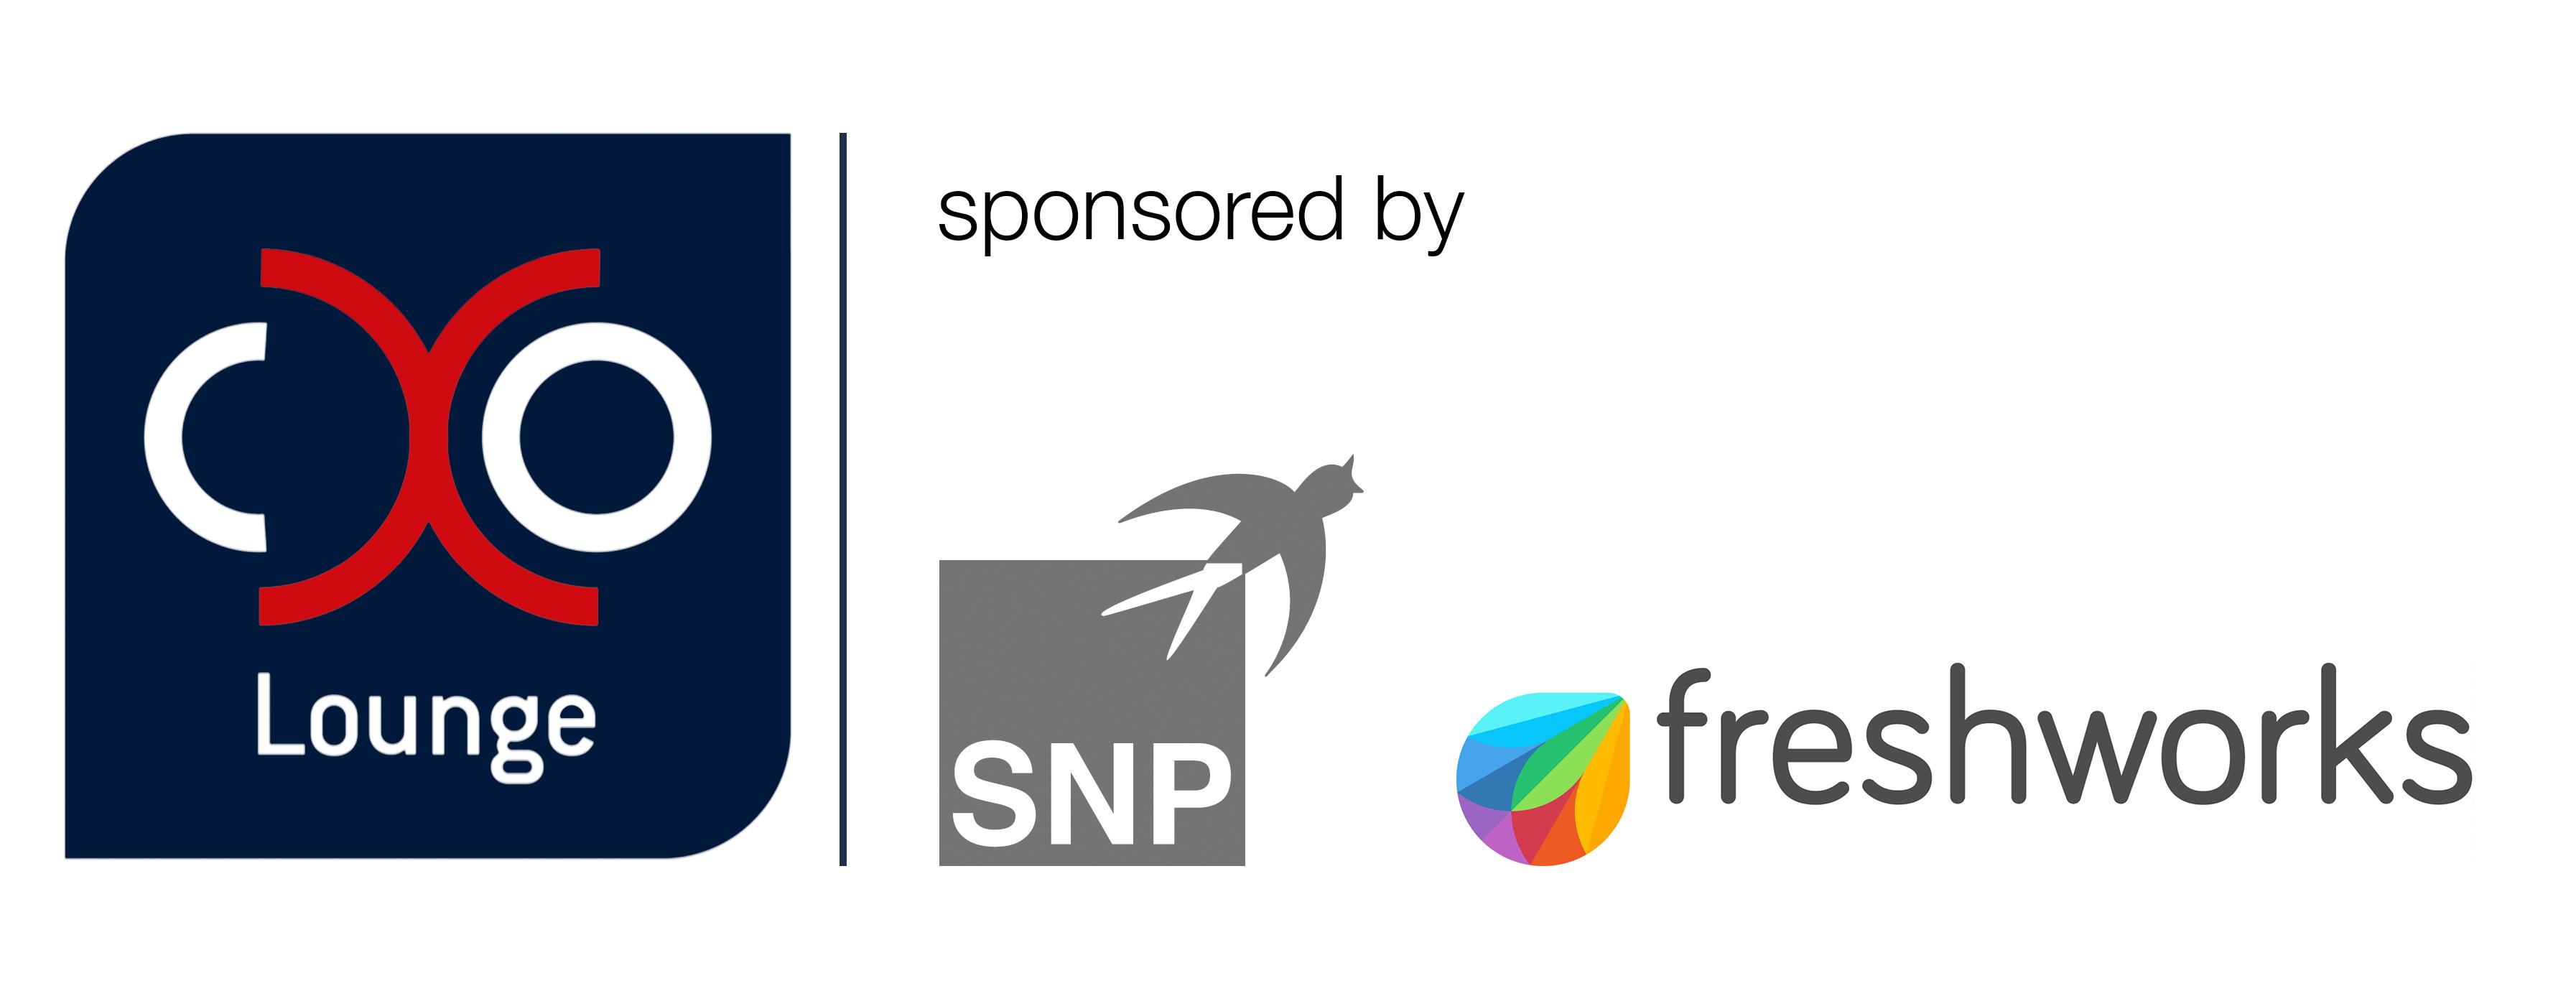 CXO Lounge Logo 2018